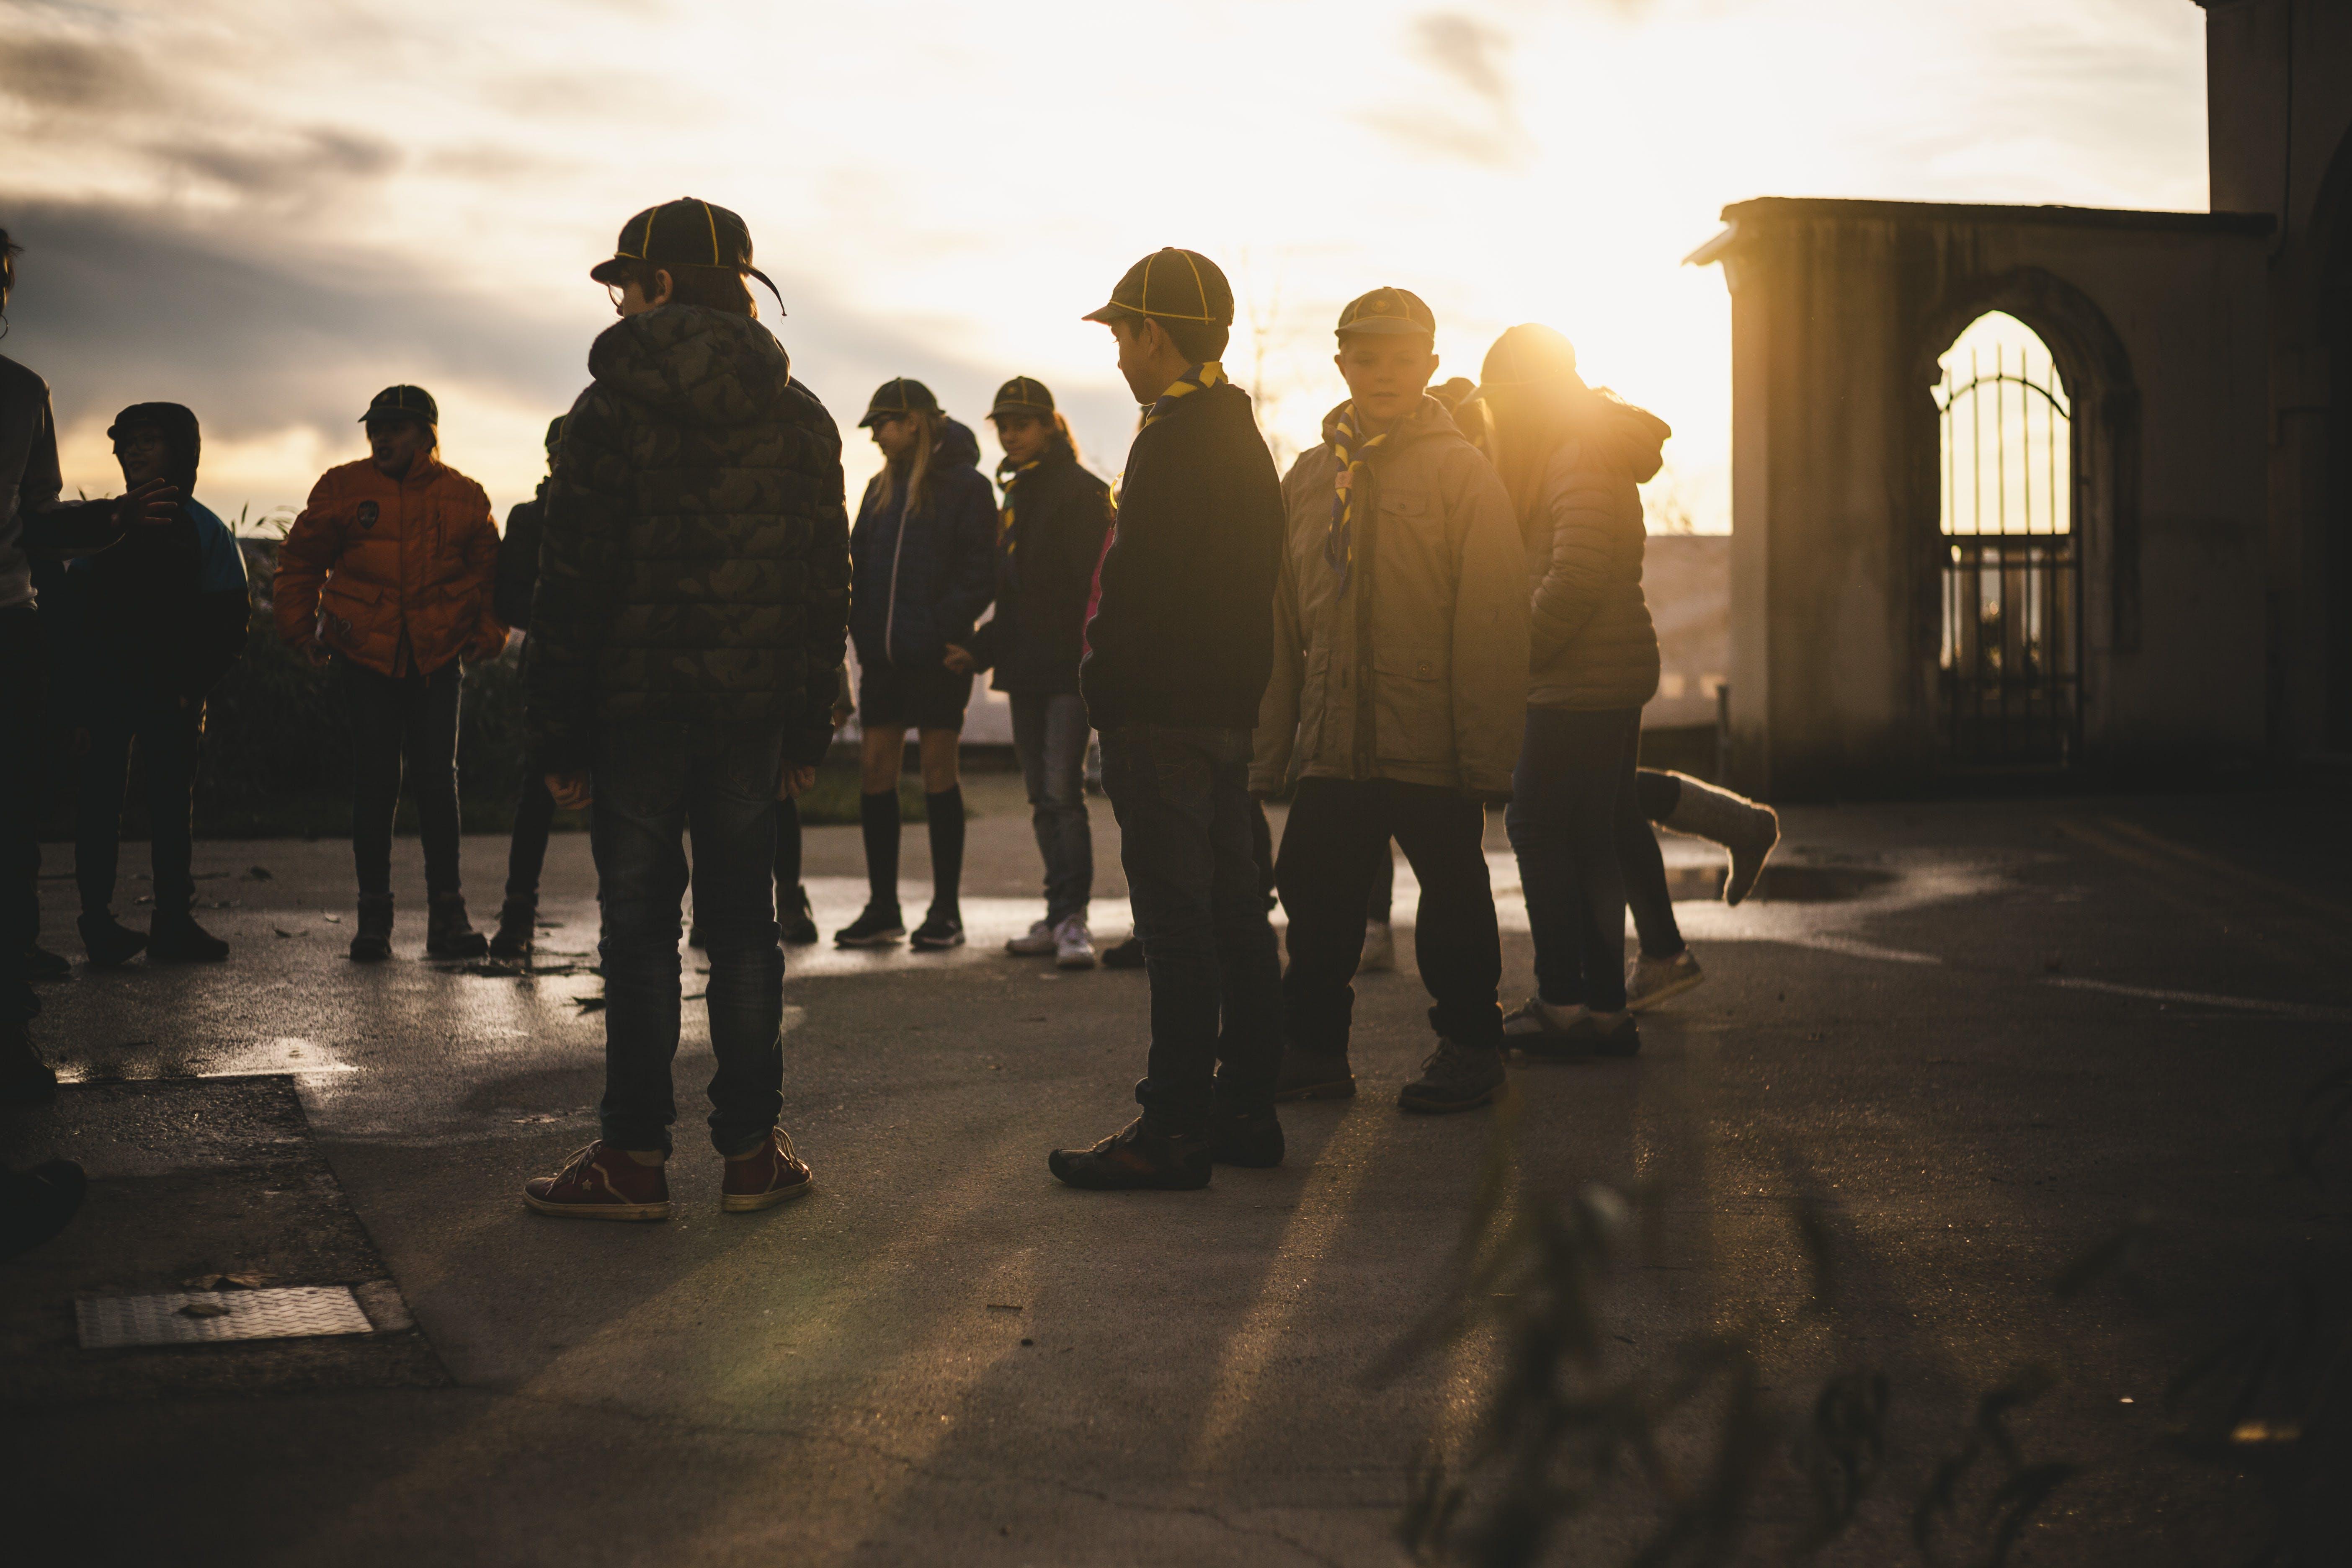 Children's Gathering on a Bridge